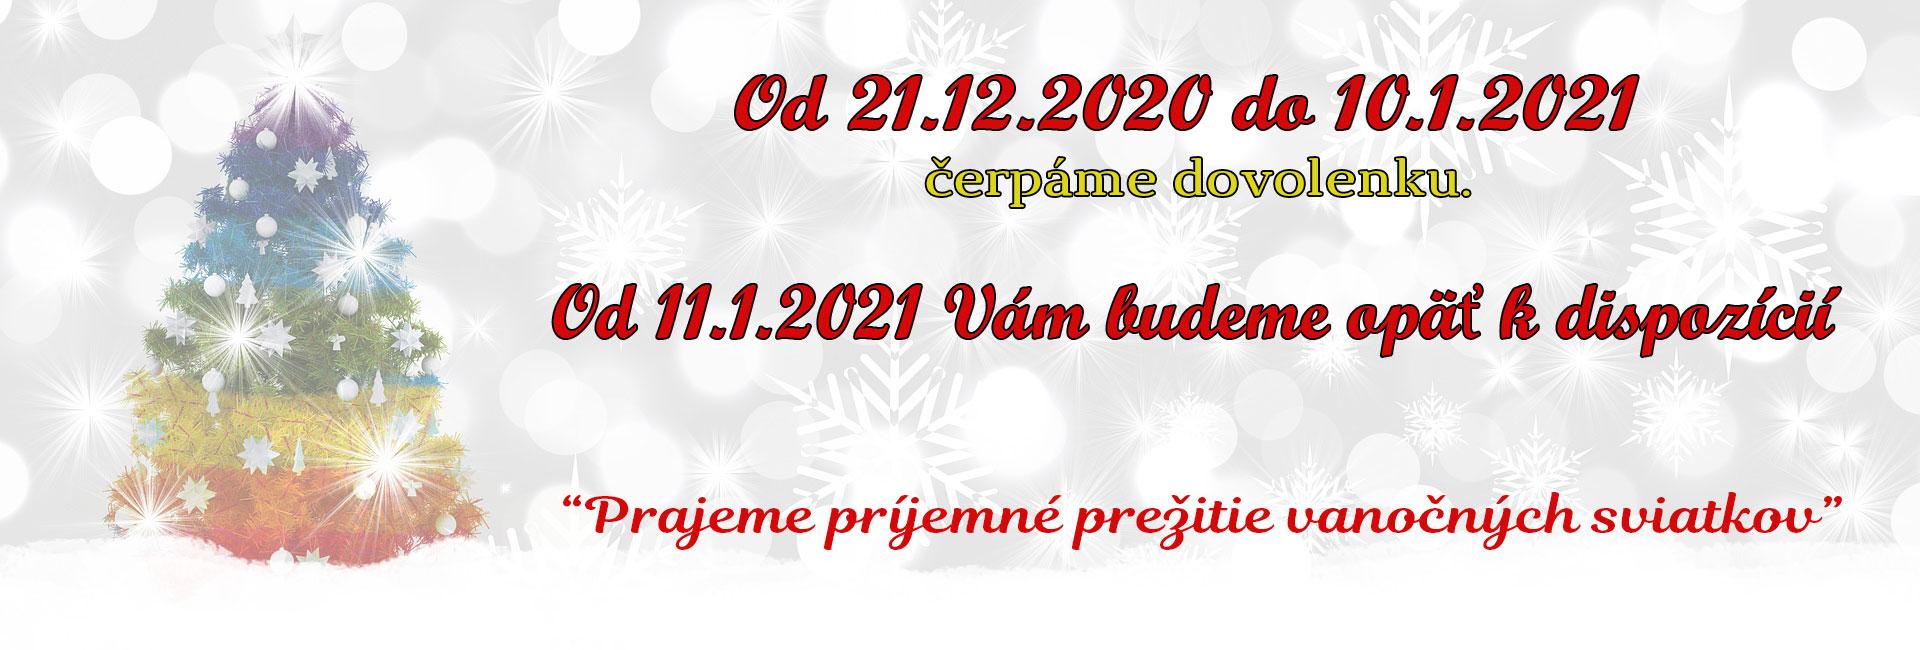 Vianoce_dovolenka